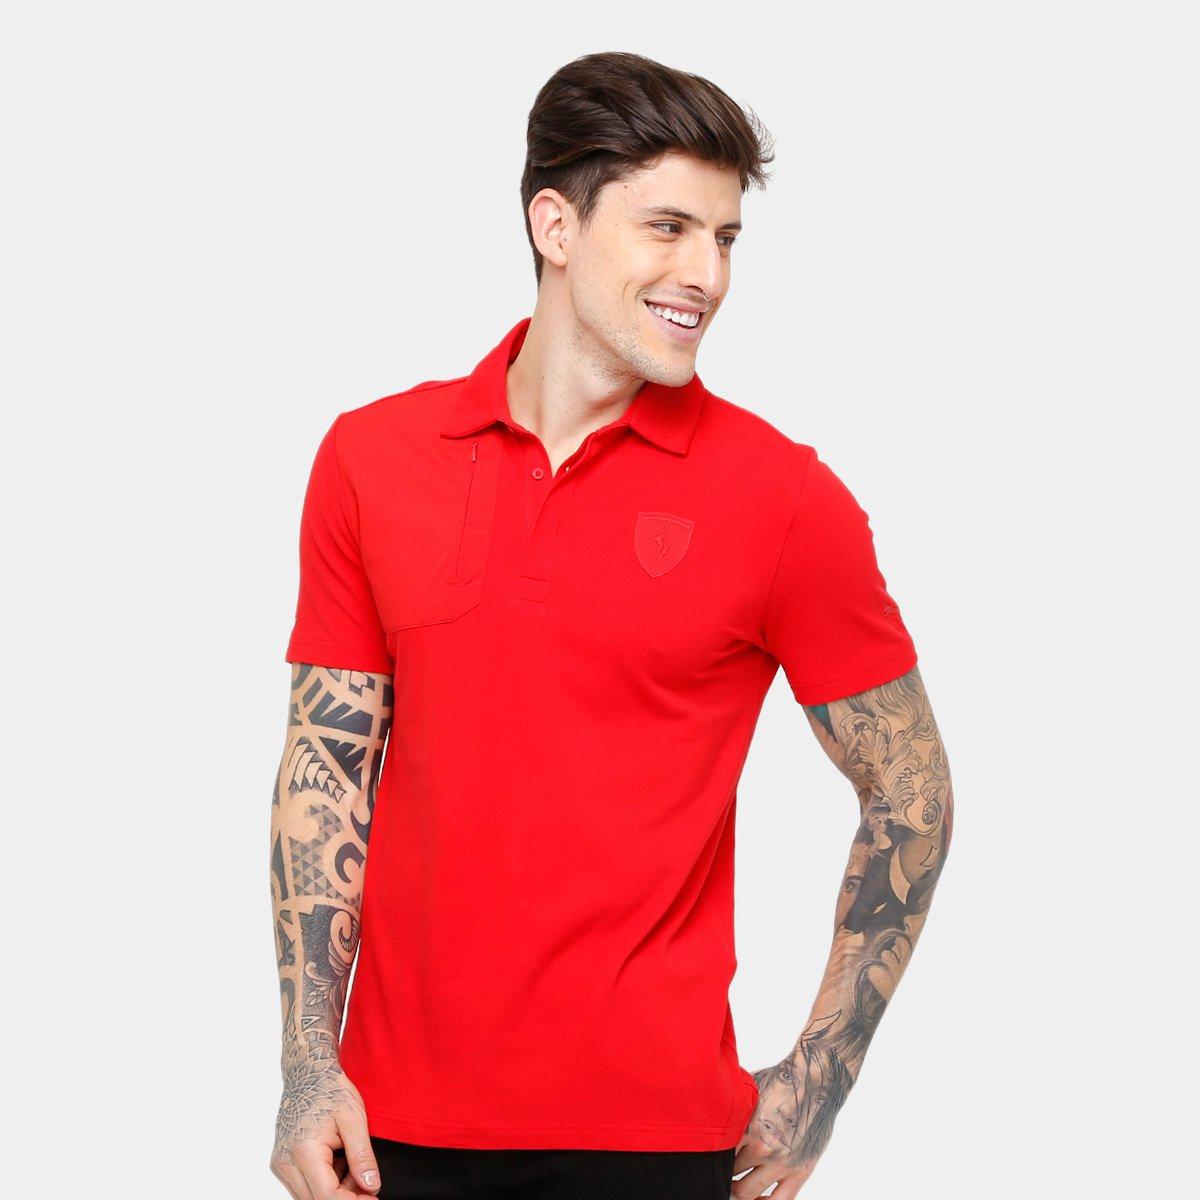 Compre Camisa Puma Ferrari Vermelha Online  d1be796def6f0